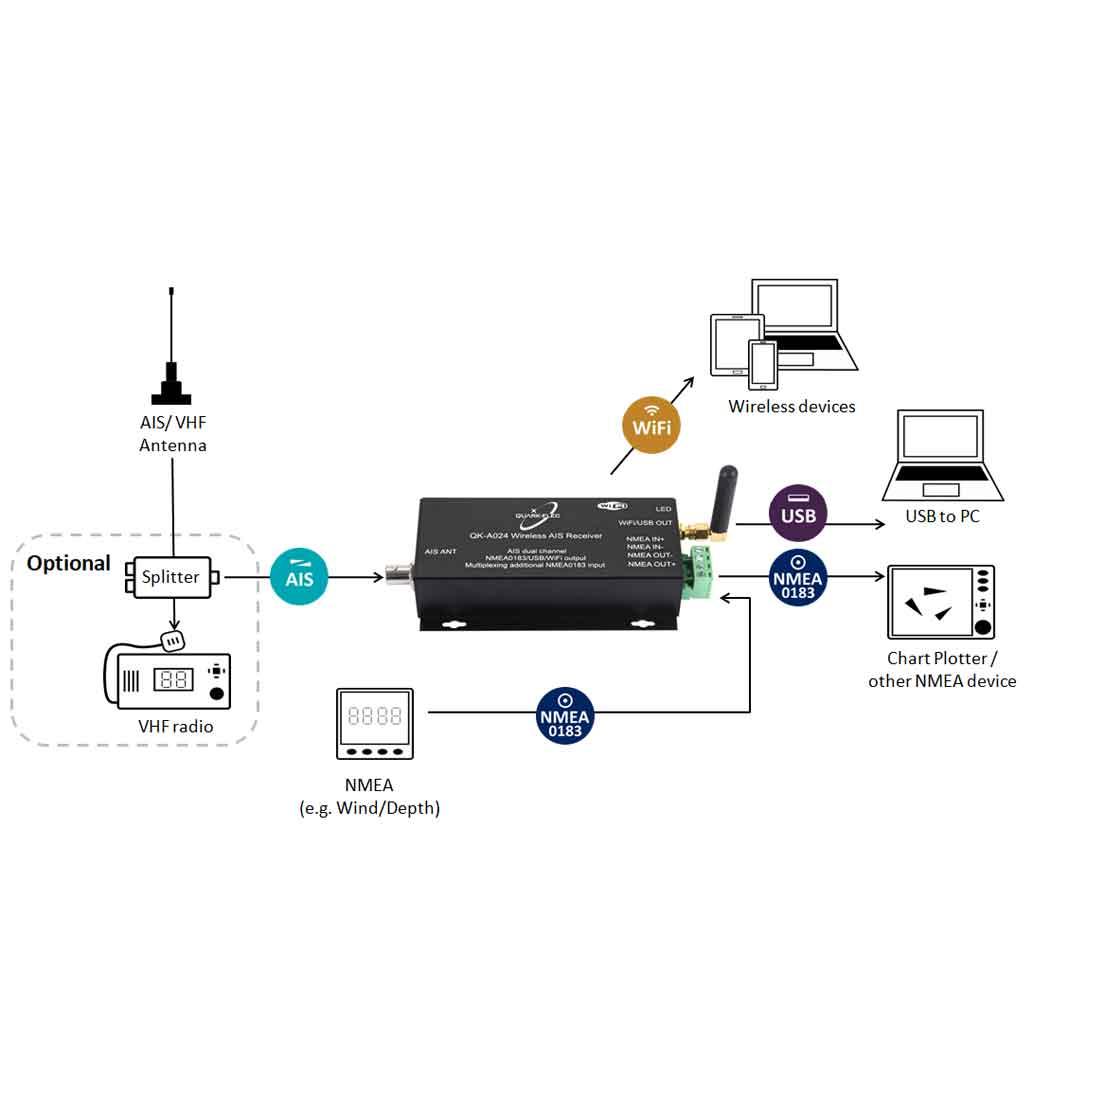 [SCHEMATICS_4CA]  QK-A024 AIS Receiver with NMEA Multiplexer + WiFi - AIS receiver, Marine  NMEA multiplexer,IoT solutions in UK   Ais Gps Wiring Diagram      Quark-elec